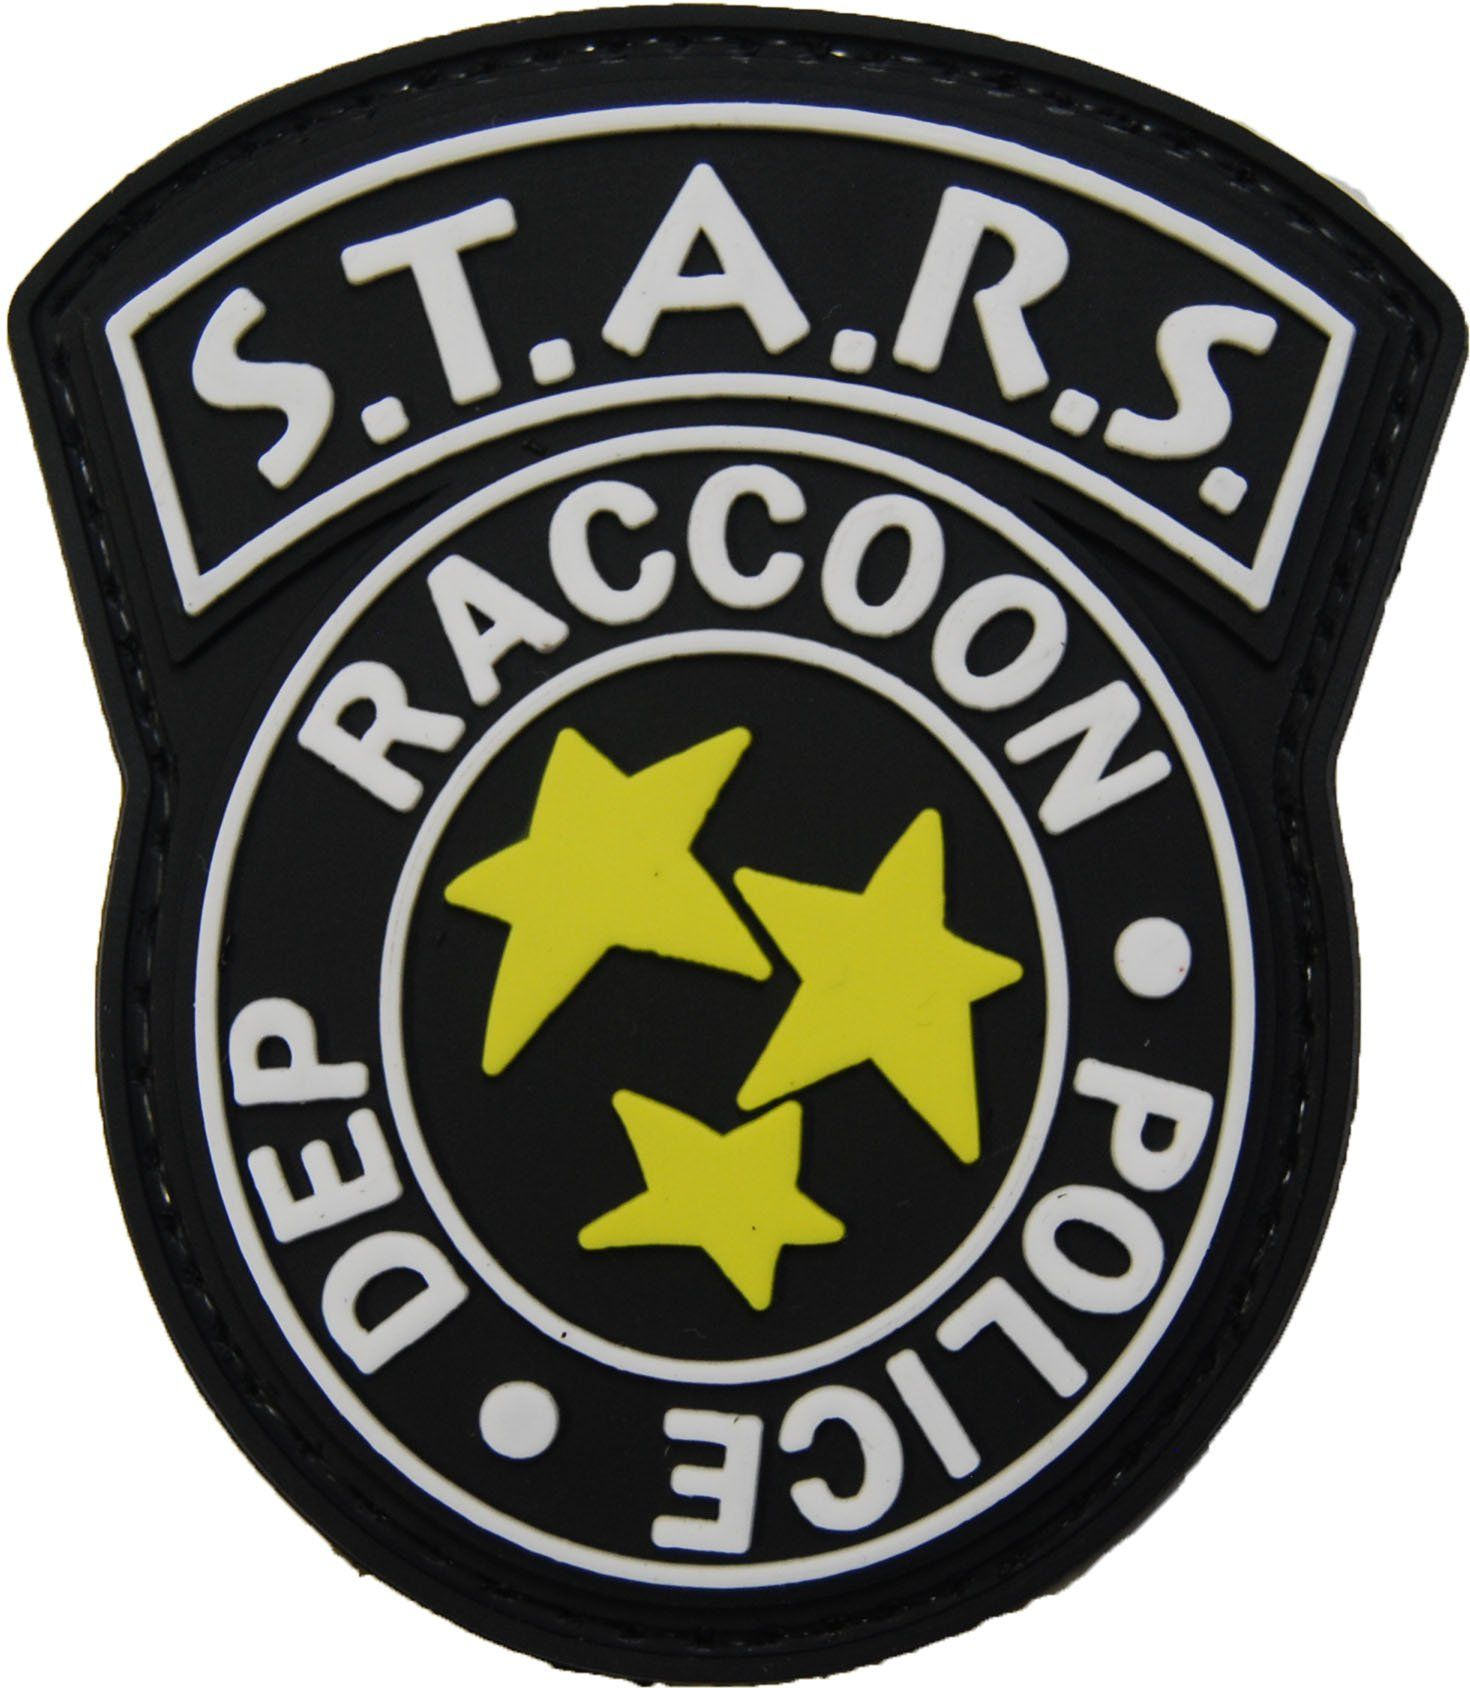 Redisent Evil S T A R S Velcro Morale Patch Resident Evil Raccoon City Resident Evil Resident Evil Movie